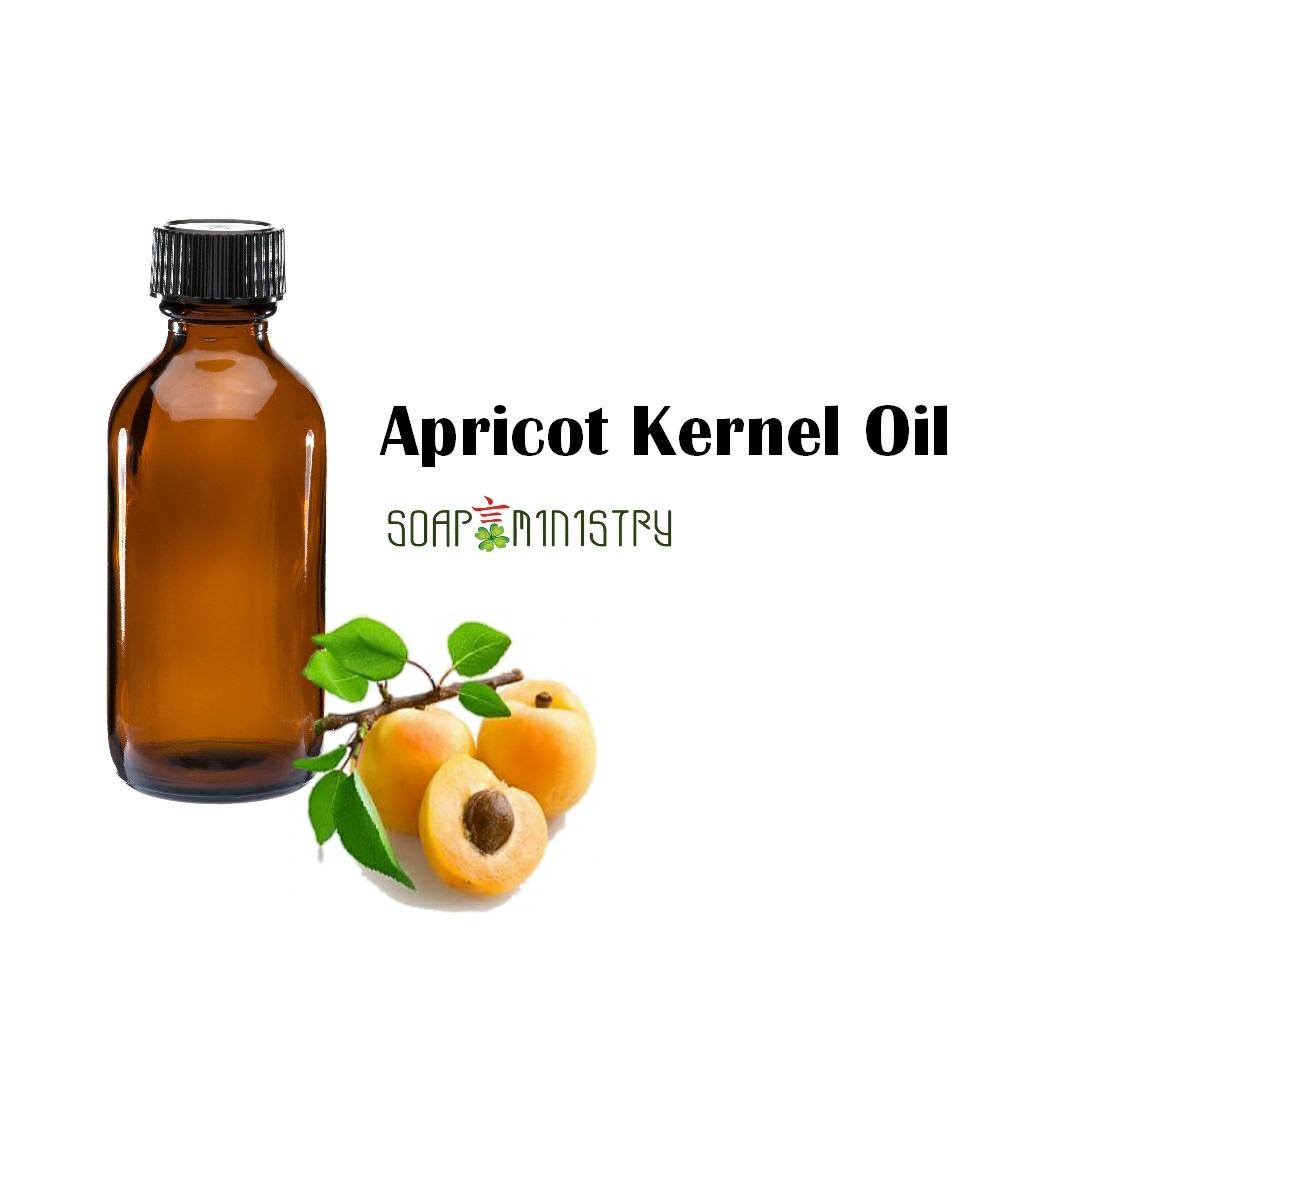 Apricot Kernel Oil 500ml